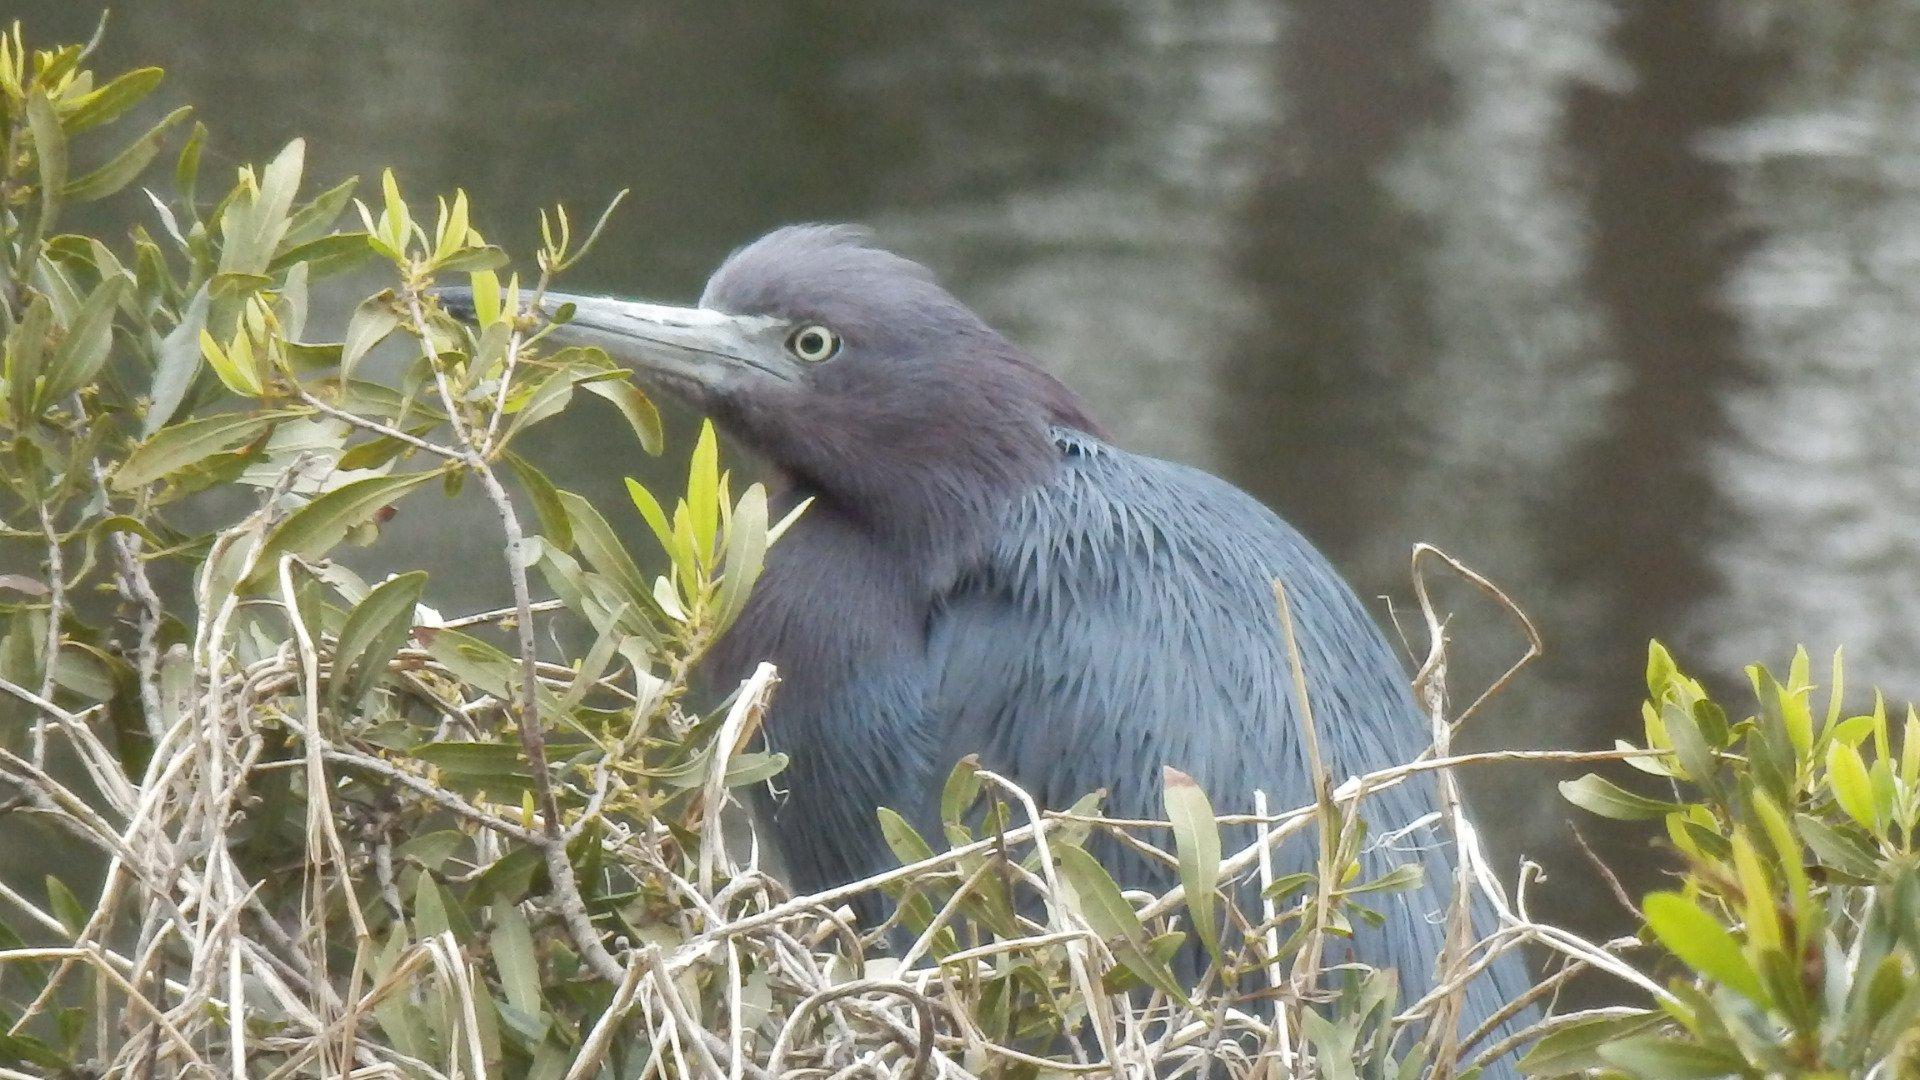 Jarvis Creek Bird Sighting